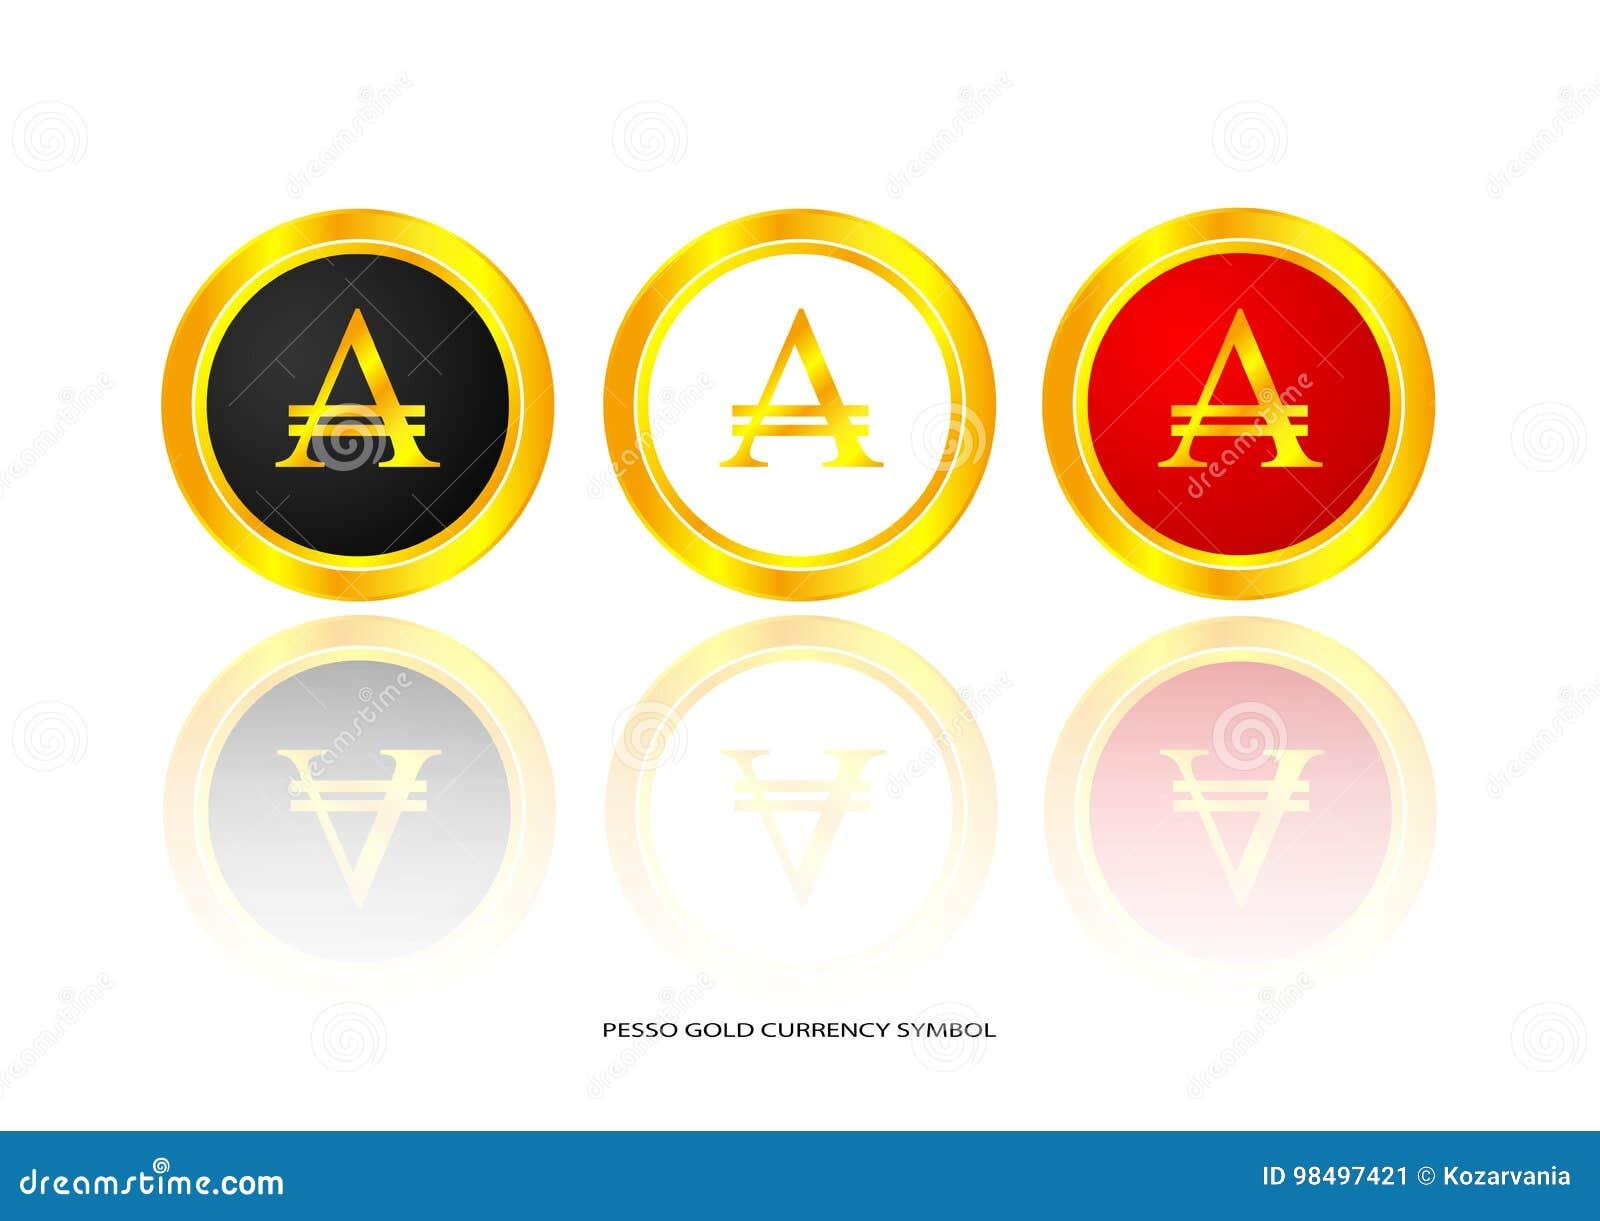 Peso Gold Symbol Stock Vector Illustration Of Brilliant 98497421